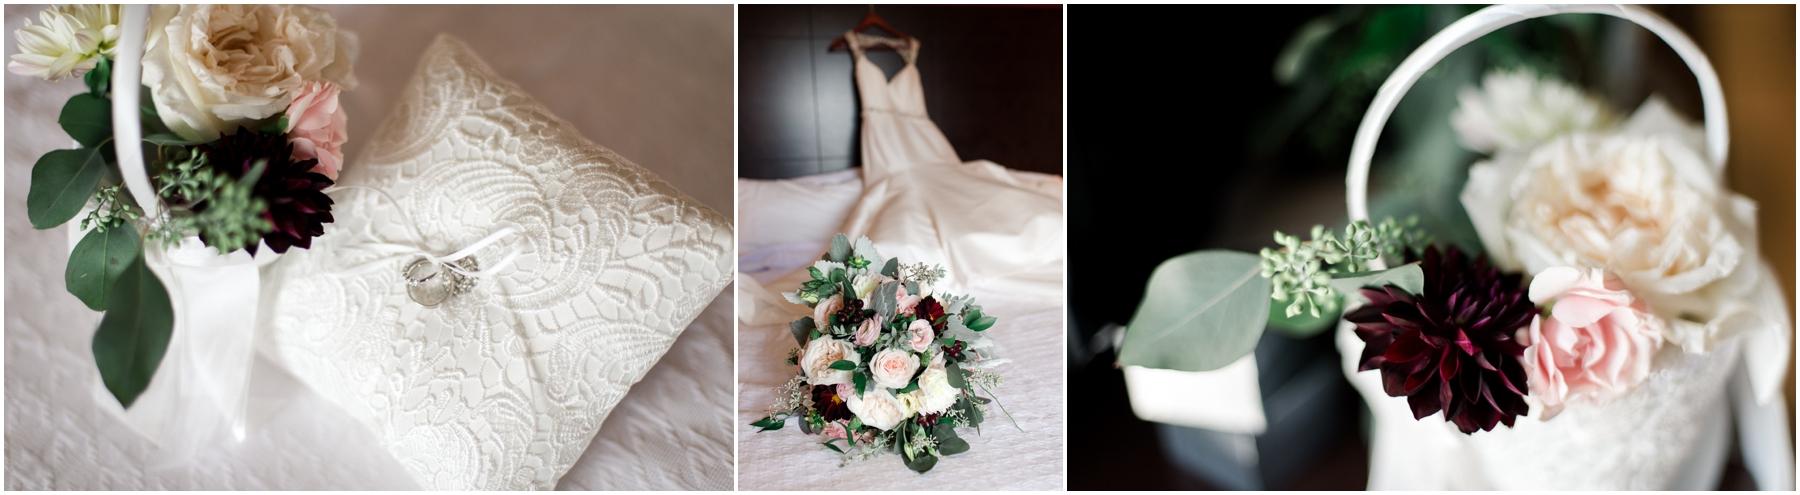 Black Creek Pioneer Village, Toronto Wedding- Precious Photography by Courtney McIntosh Becky & Andy_0104